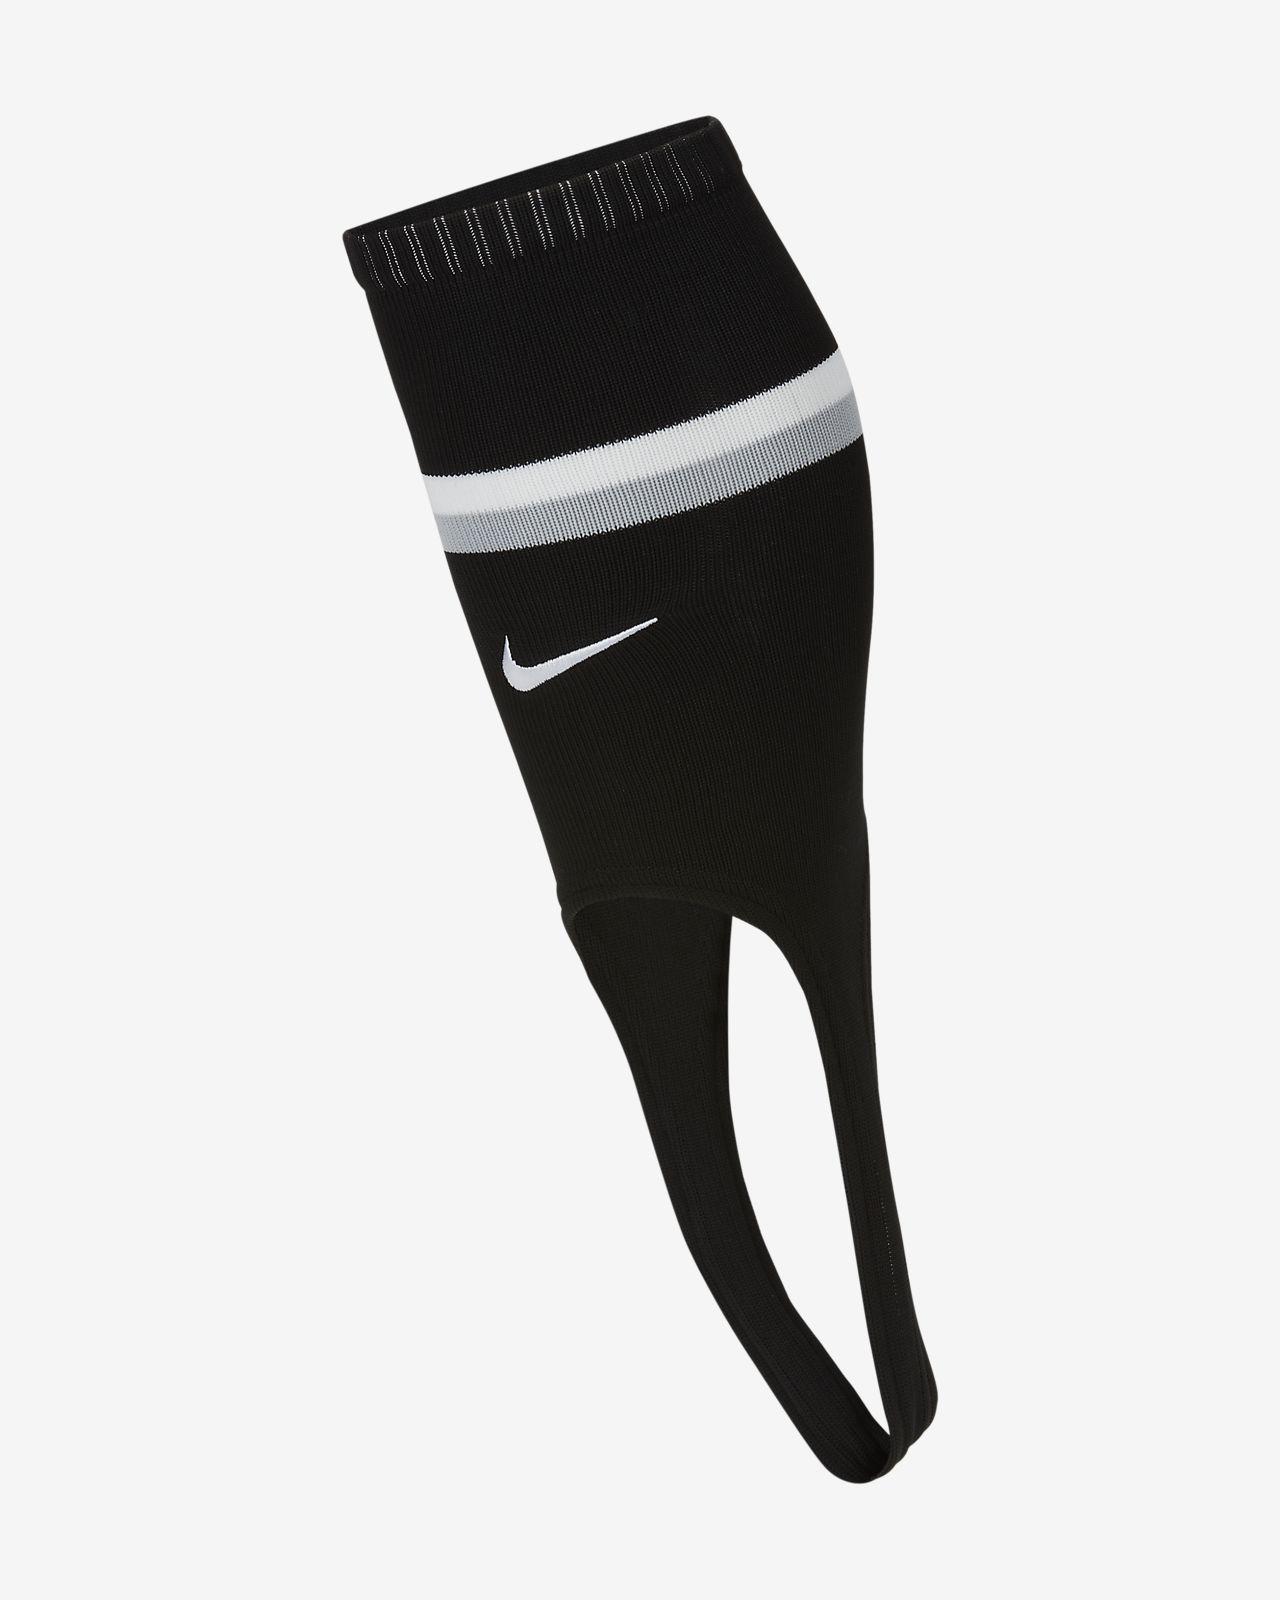 Nike Vapor Baseball Stirrup